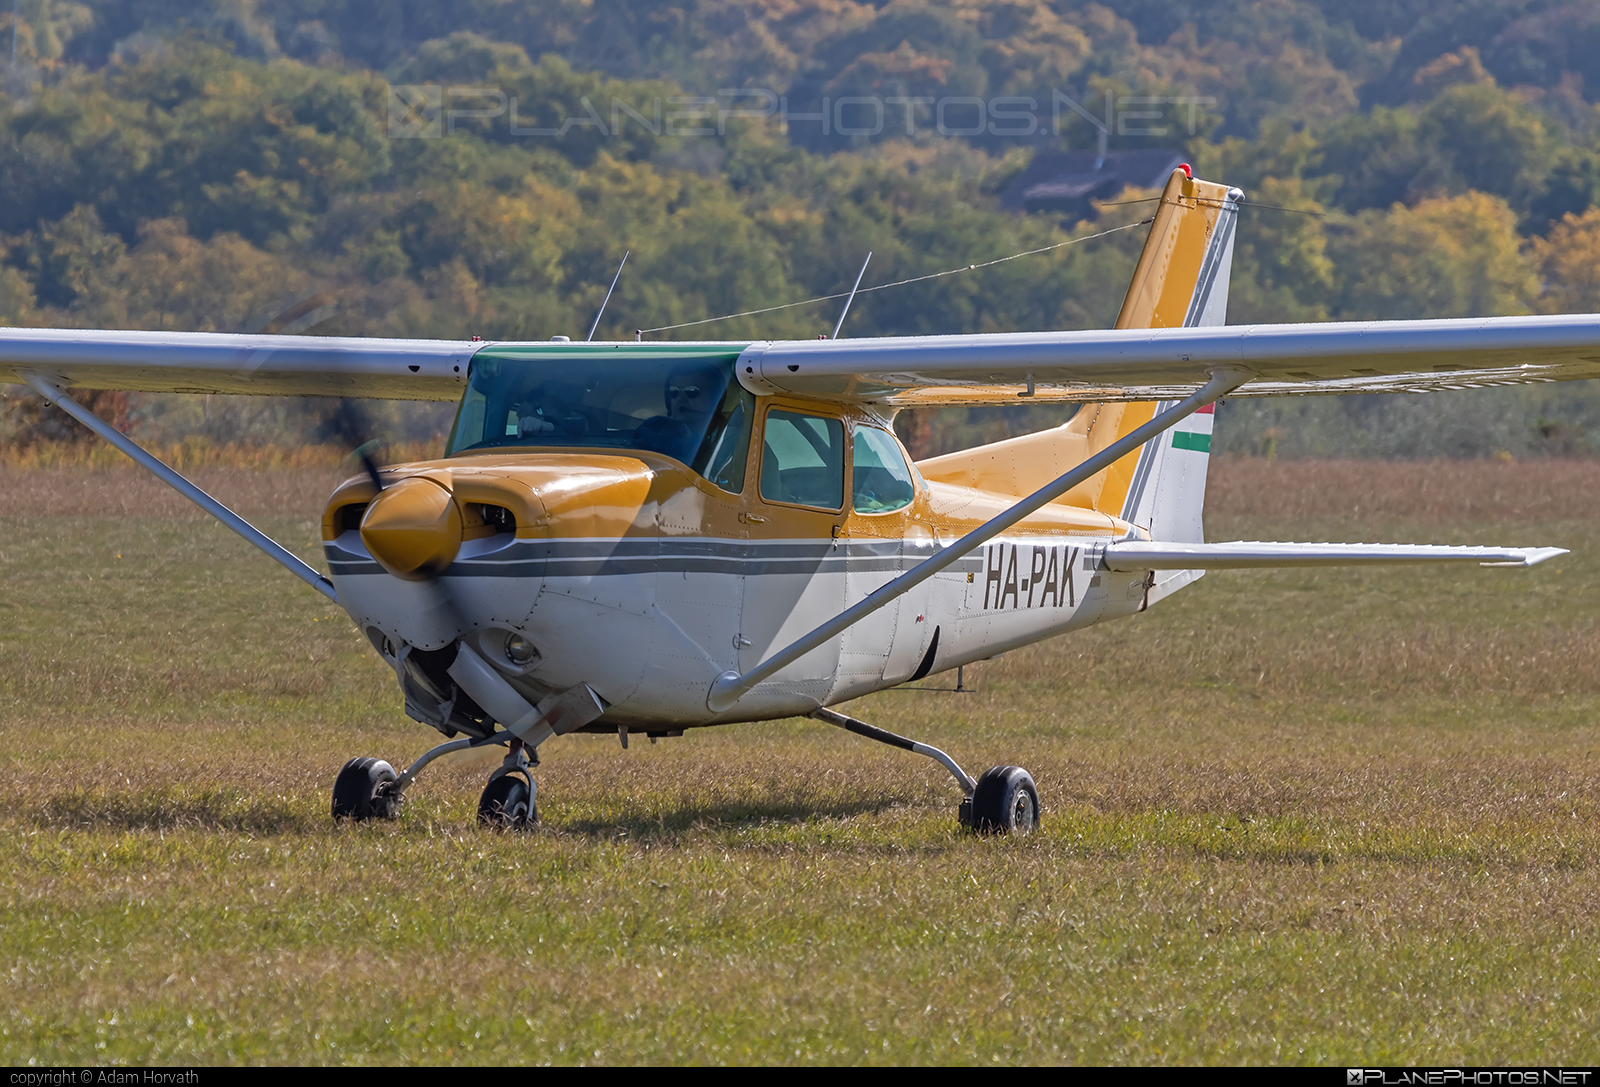 Cessna 172RG Cutlass RG II - HA-PAK operated by Private operator #cessna #cessna172 #cessna172cutlass #cessna172rg #cessna172rgcutlass #cessnacutlass #cutlass172rg